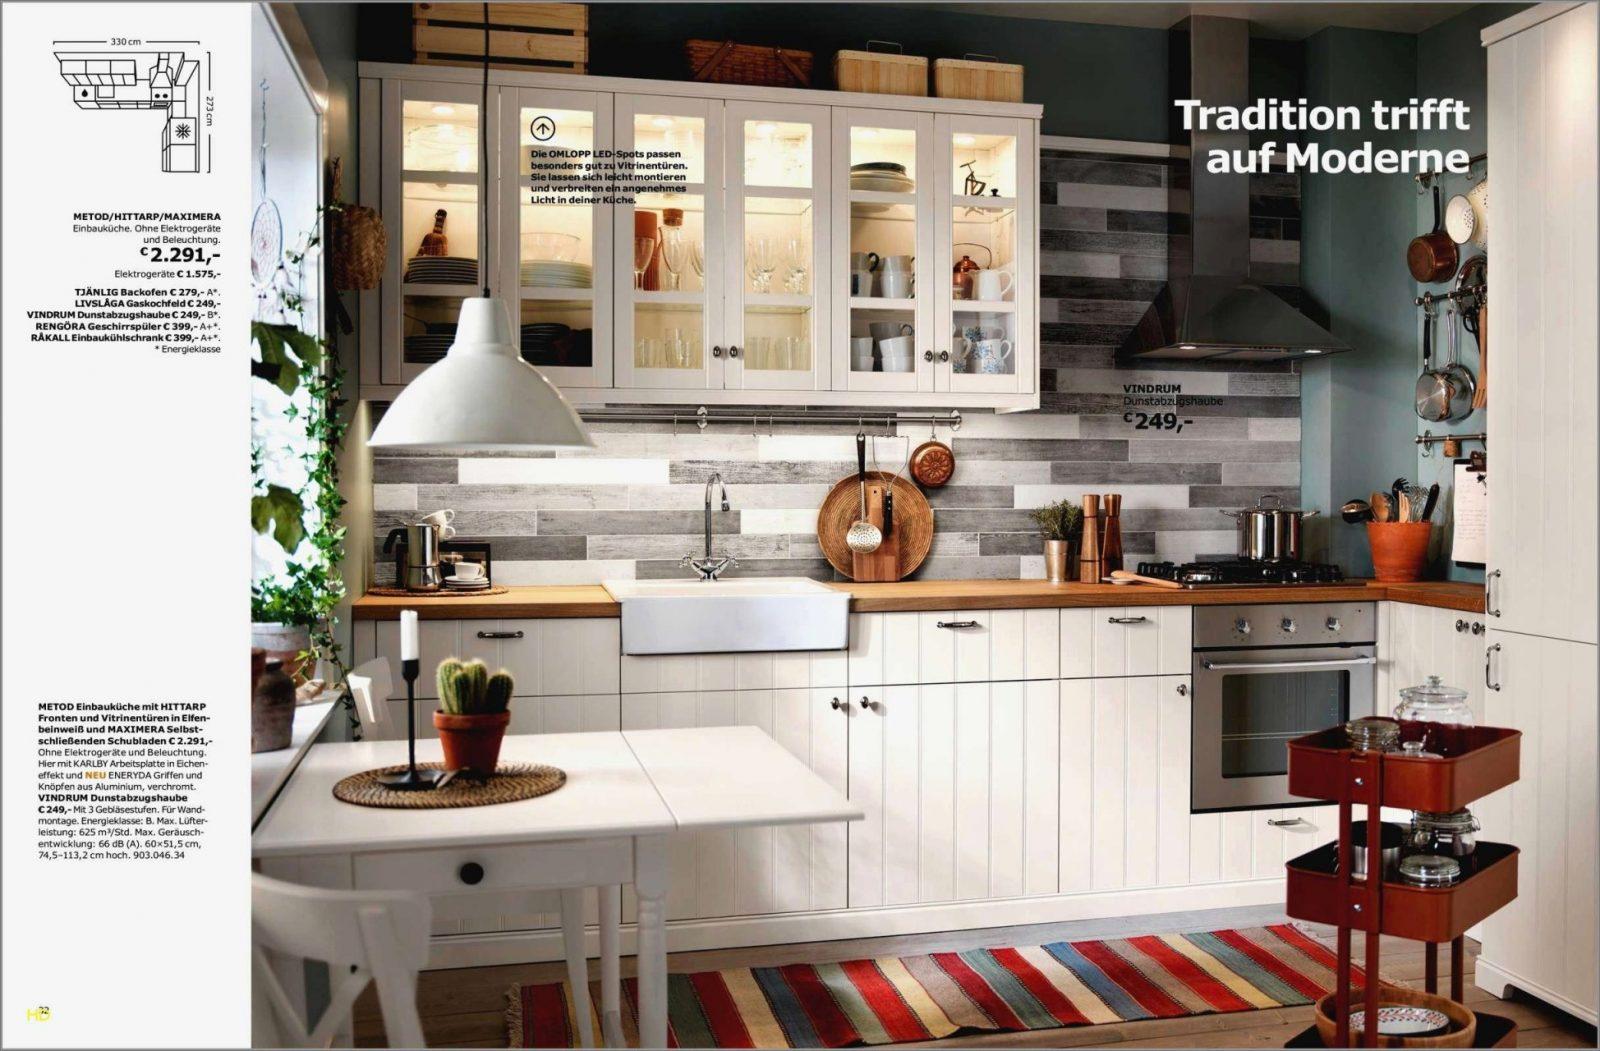 Ikea Faktum Metod Kombinieren Luxus Ikea Küche Faktum Metod von Faktum Und Metod Kombinieren Bild